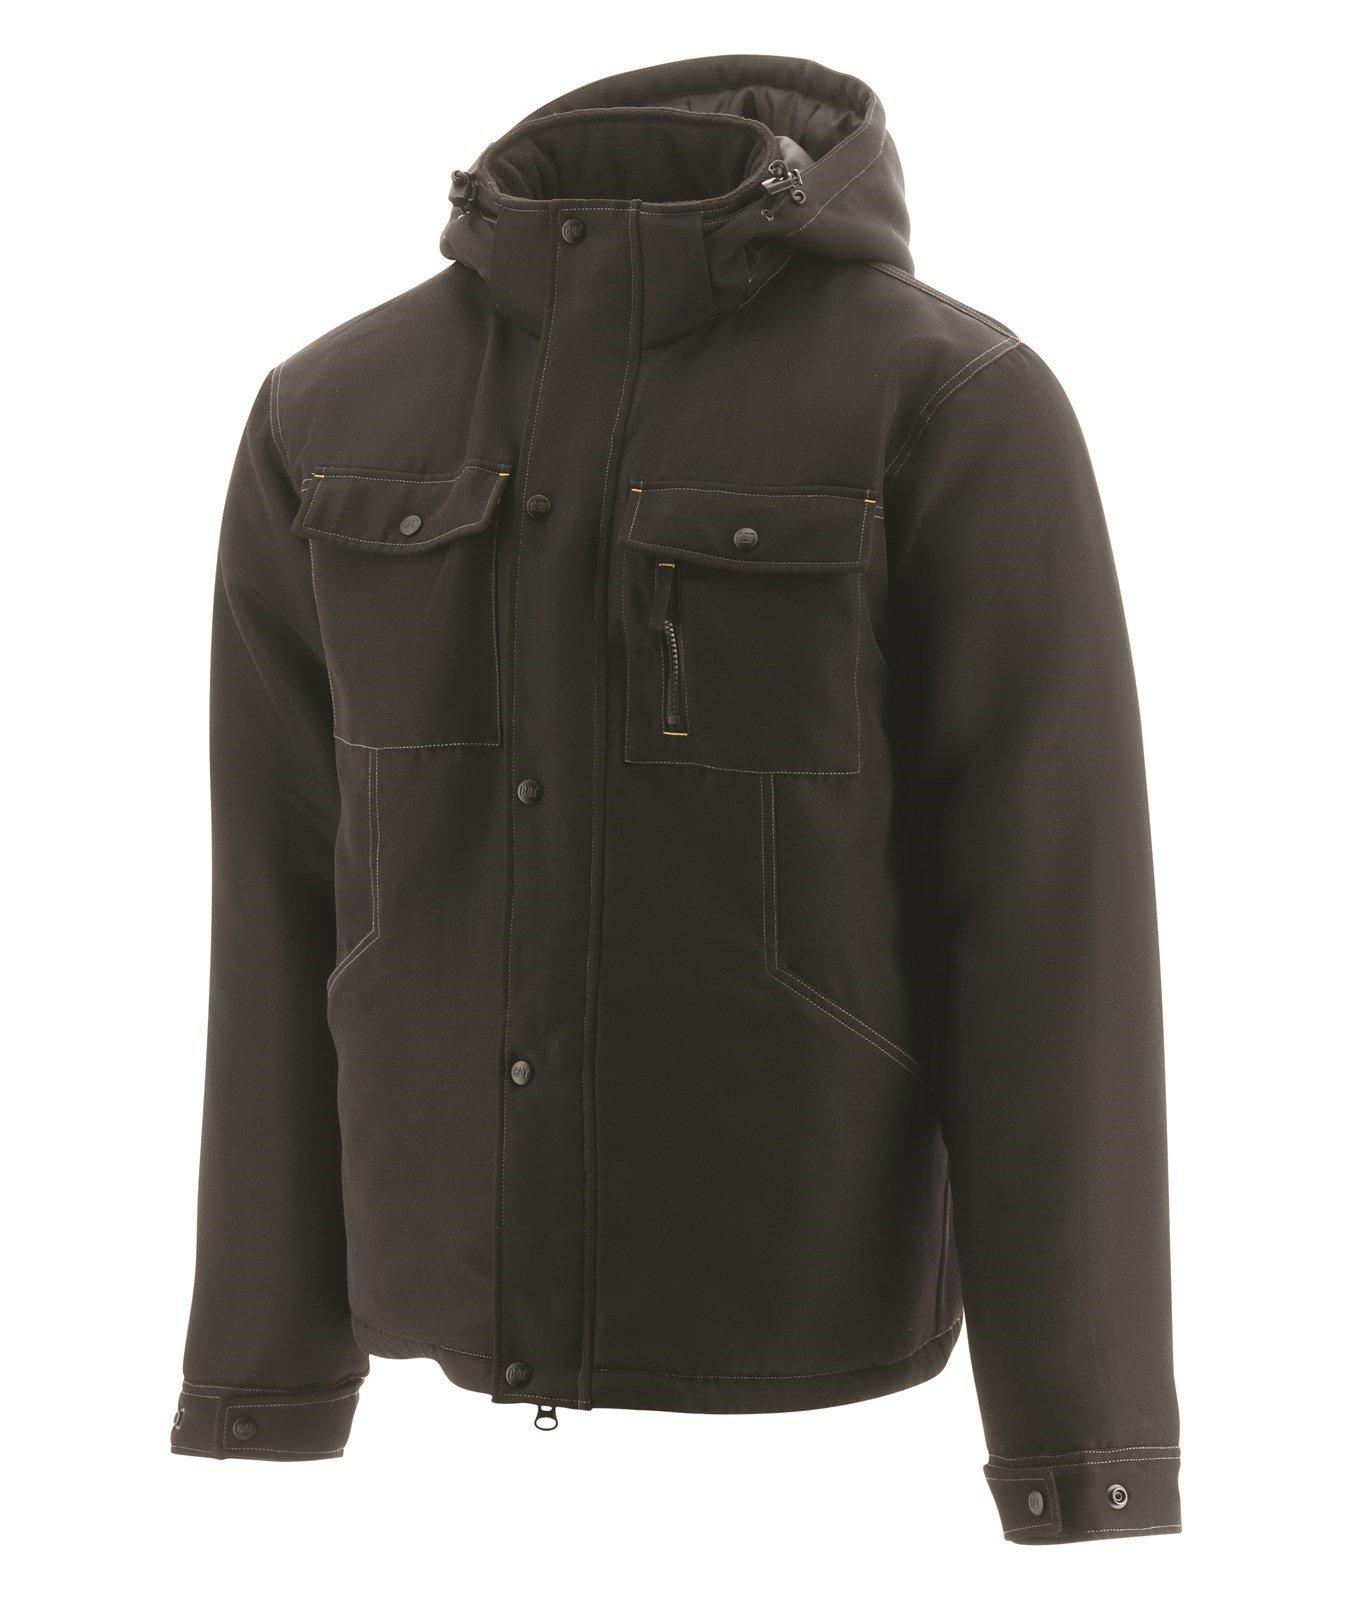 Caterpillar Unisex Stealth Insulated Workwear Jacket Black 31677 - Black Sml